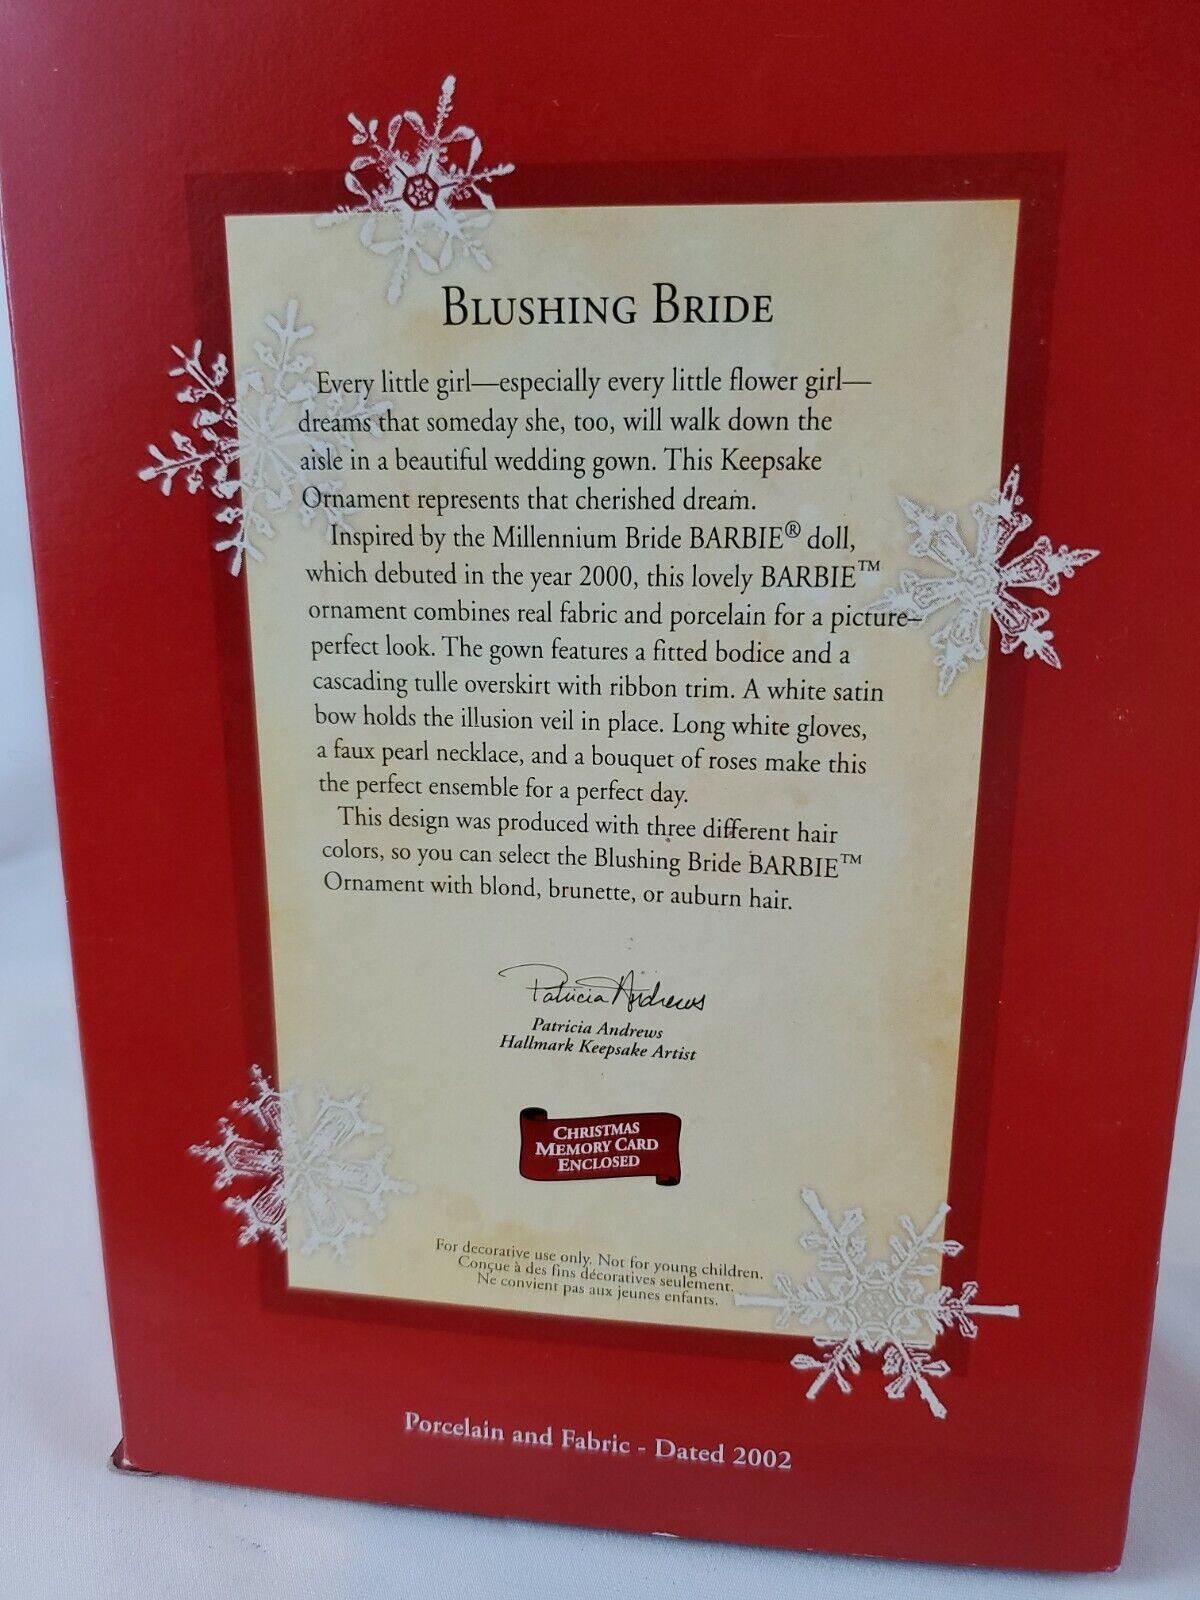 BRUNETTE  IN ORG BOX BLUSHING BRIDE  2002 BARBIE HALLMARK ORNAMENTS